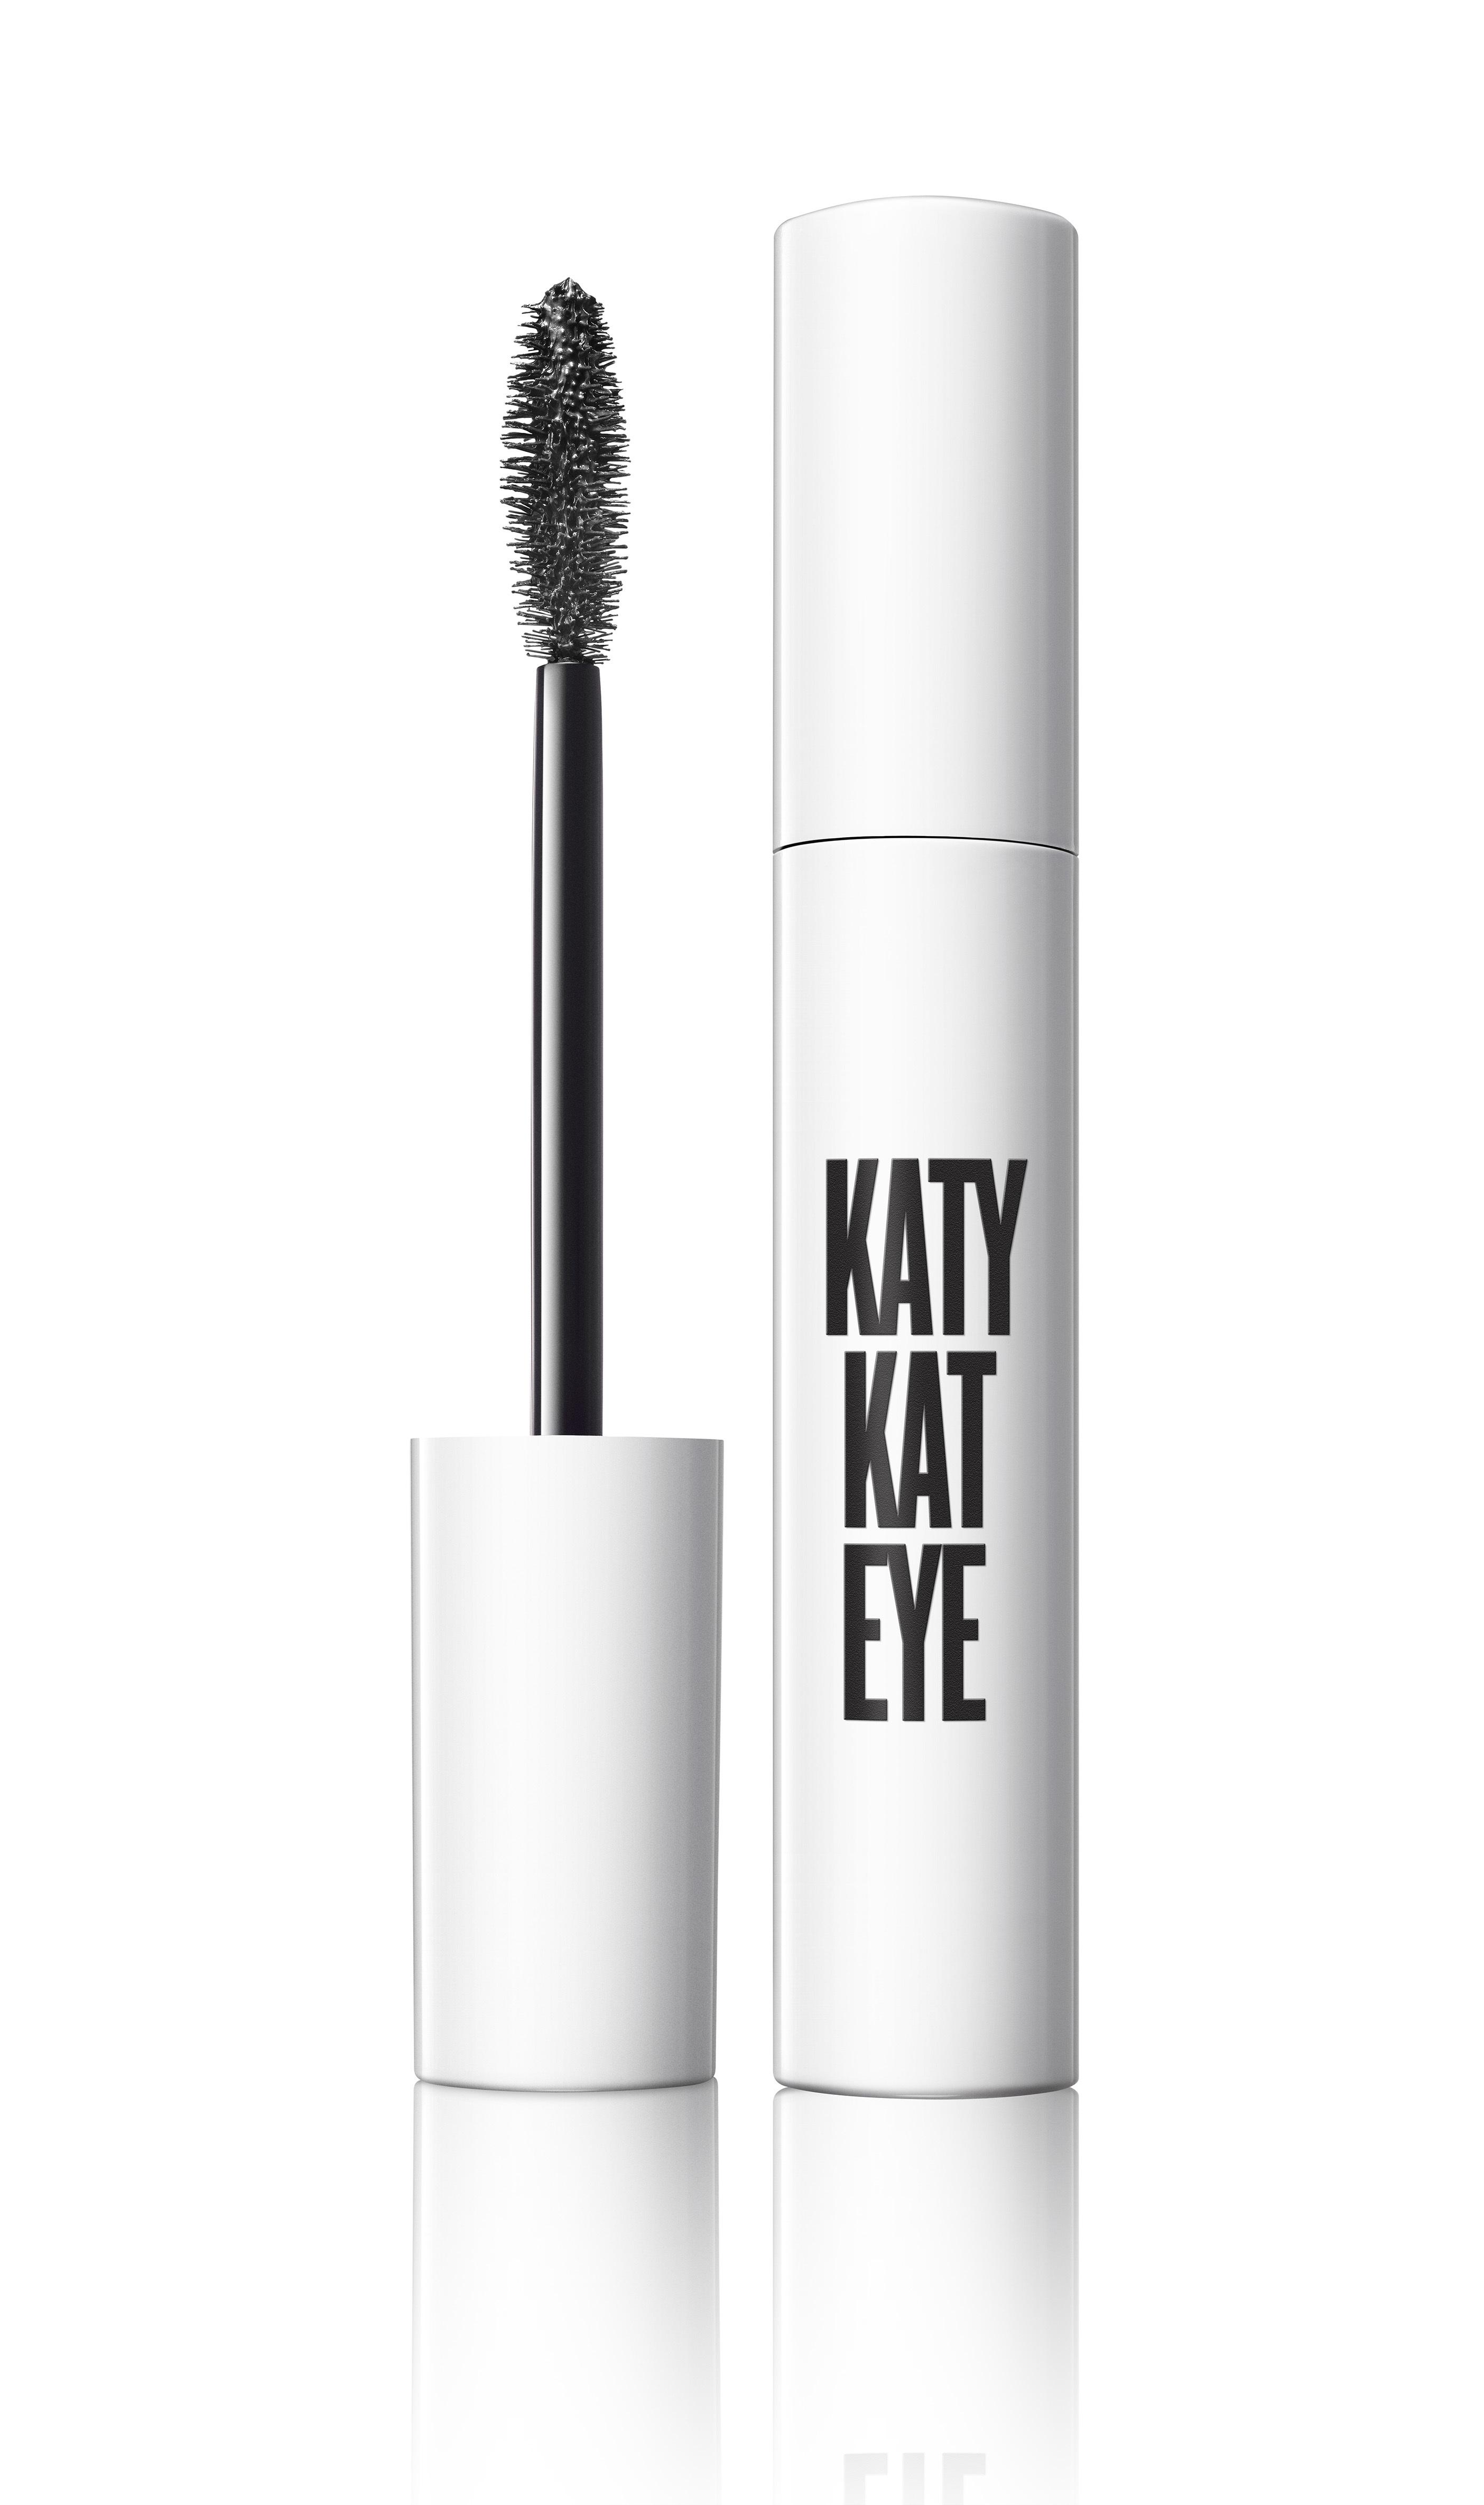 55a7239323f CoverGirl Katy Kat Eye Mascara reviews in Mascara - ChickAdvisor